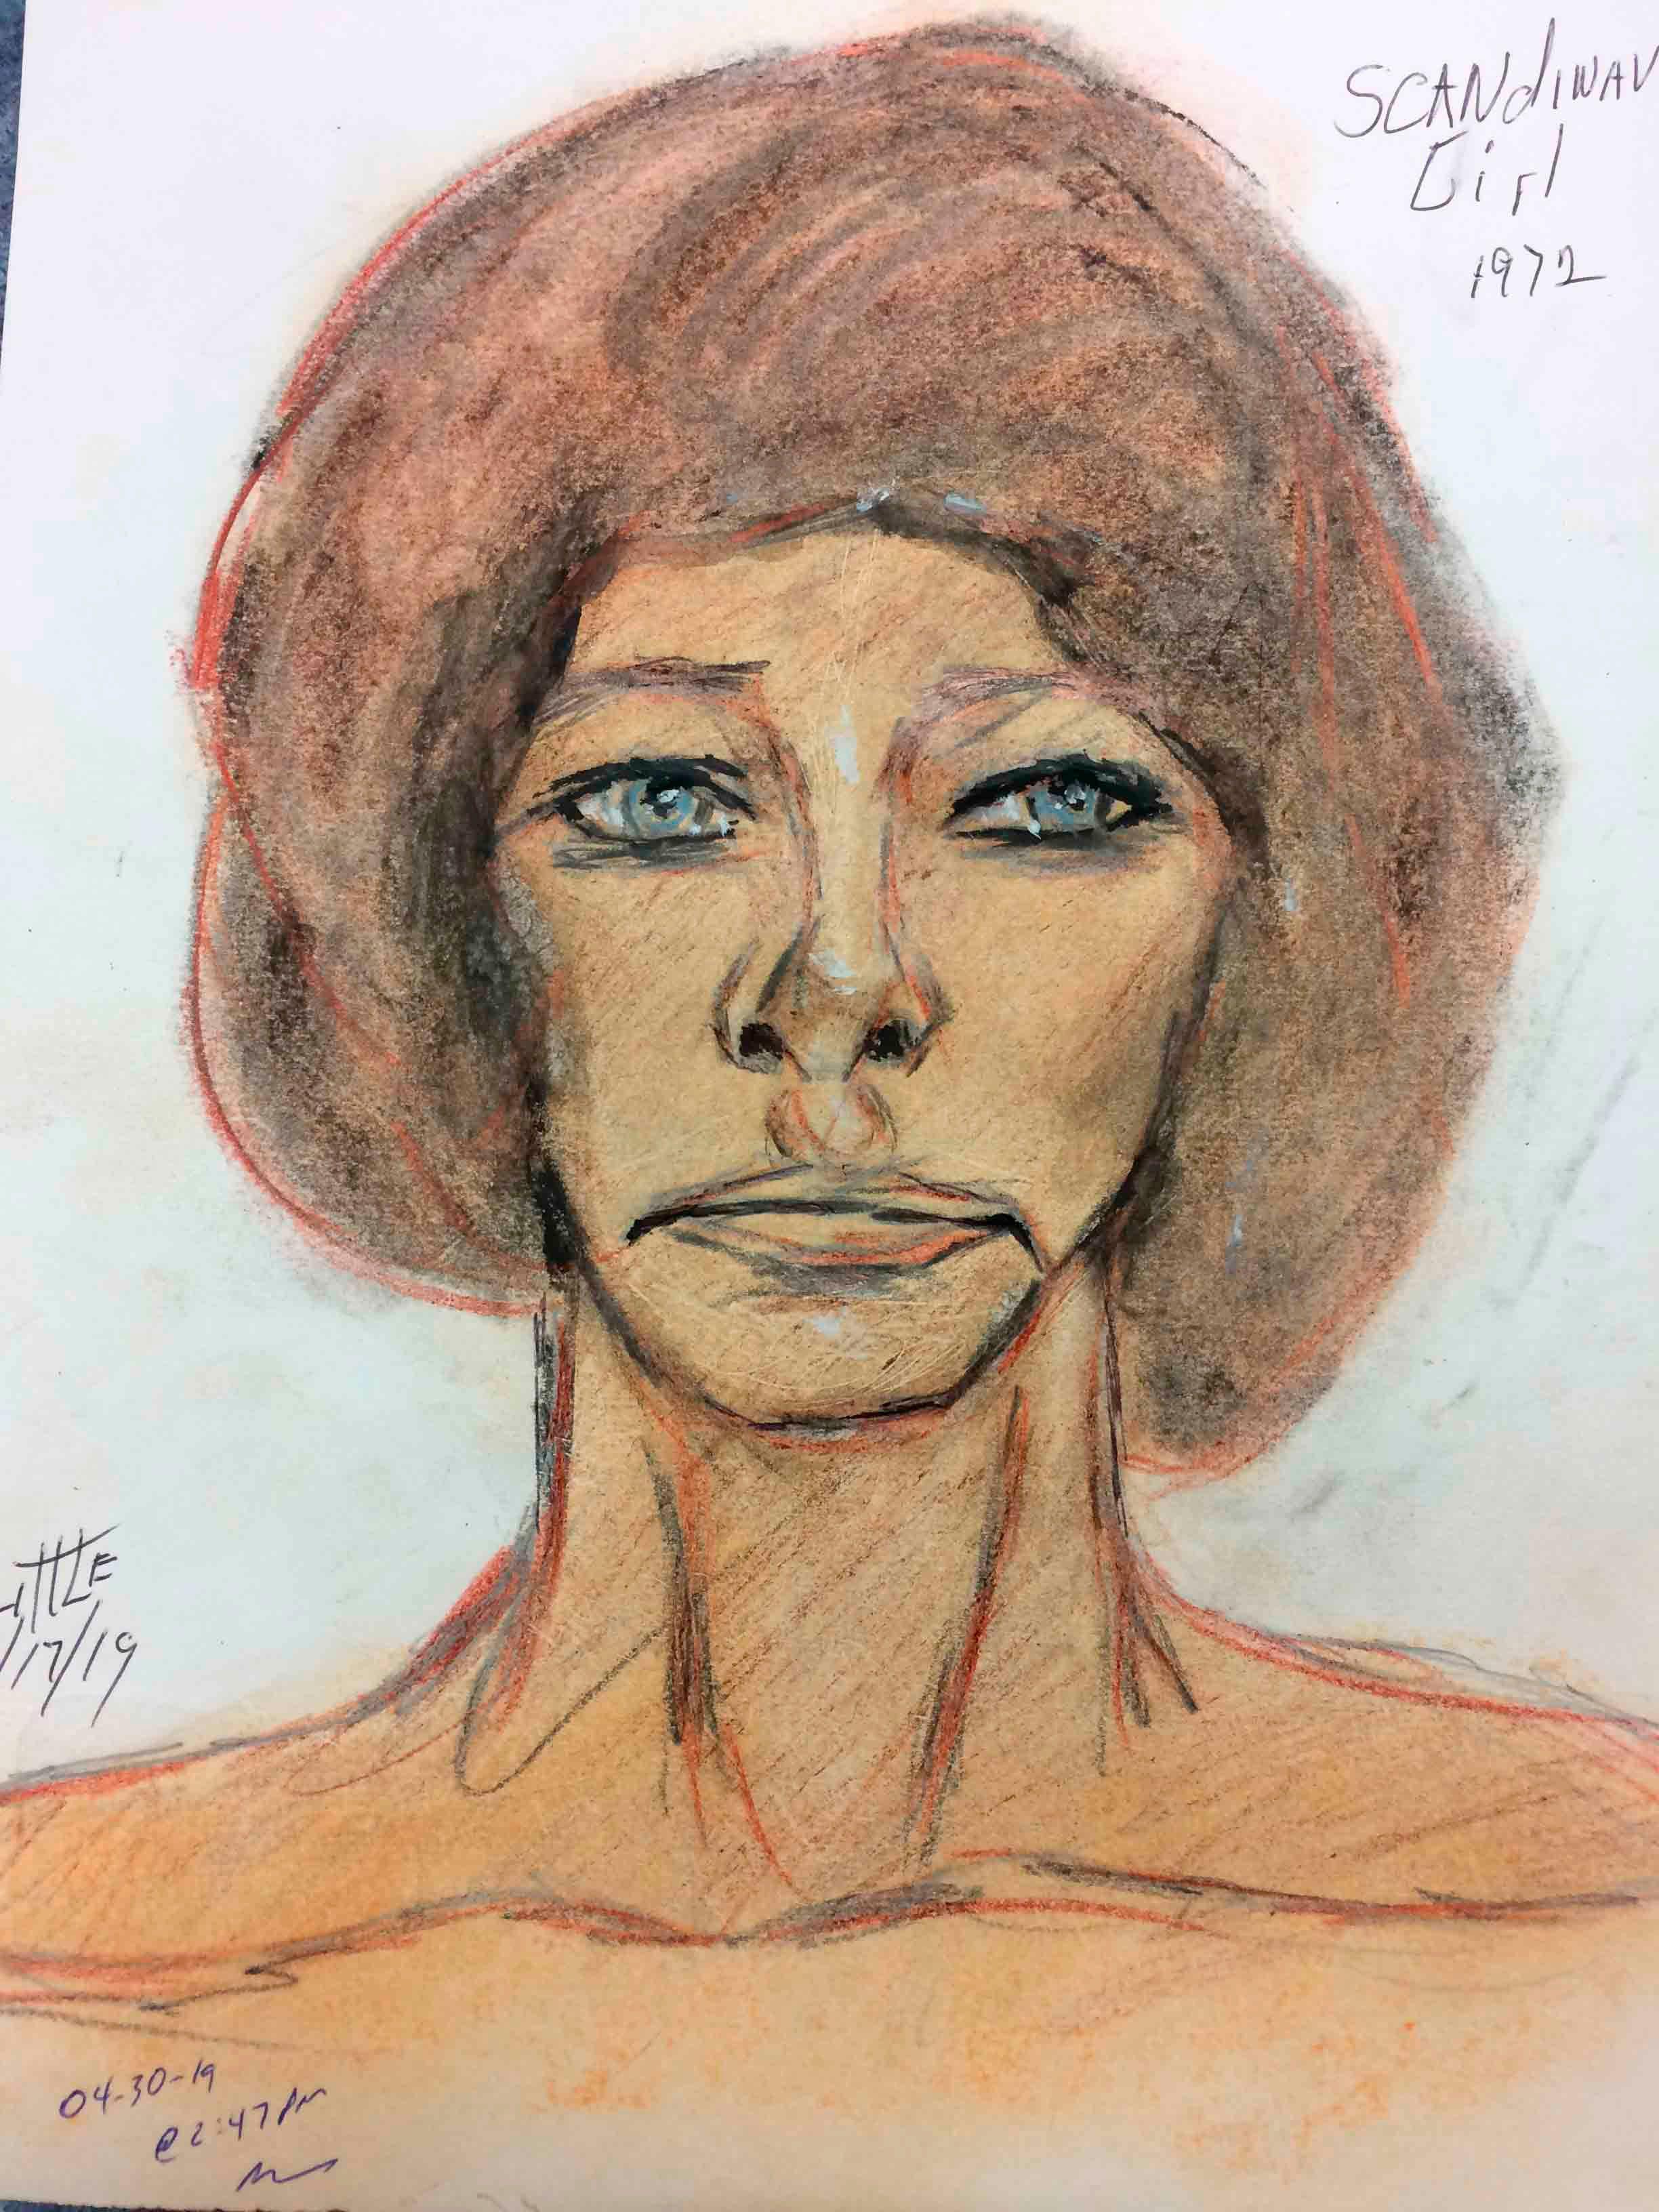 Mujer blanca asesinada en 1970o 1971 (FBI)